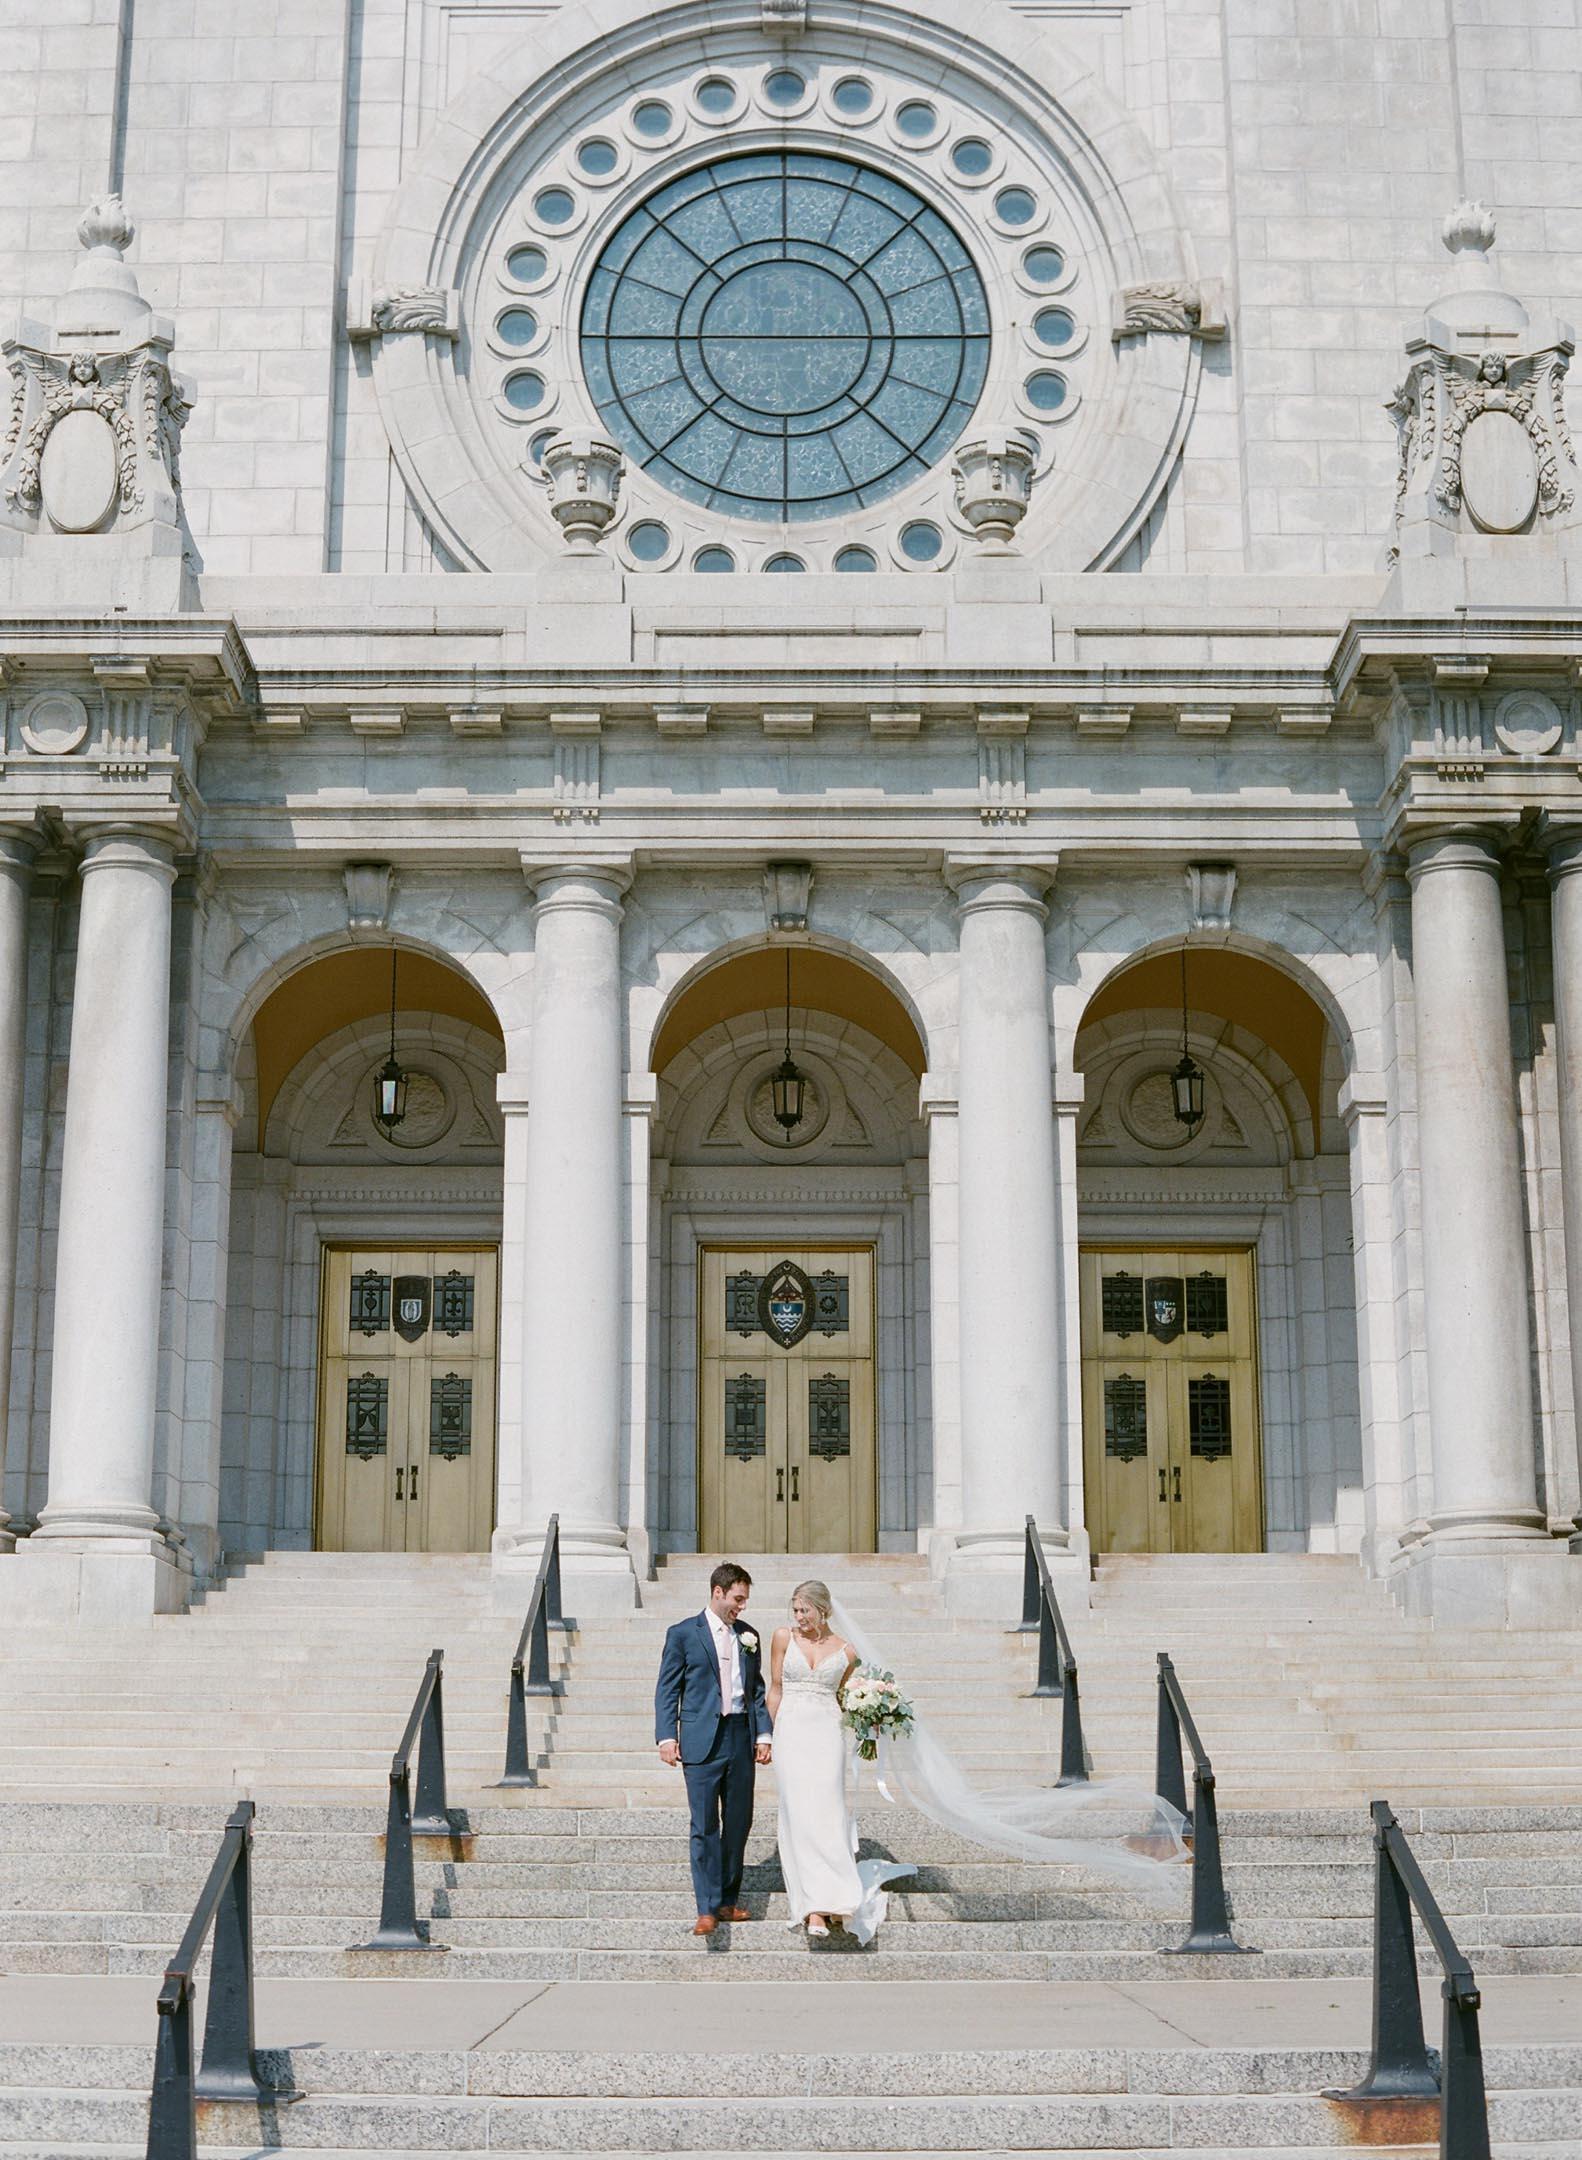 The basilica of saint mary wedding